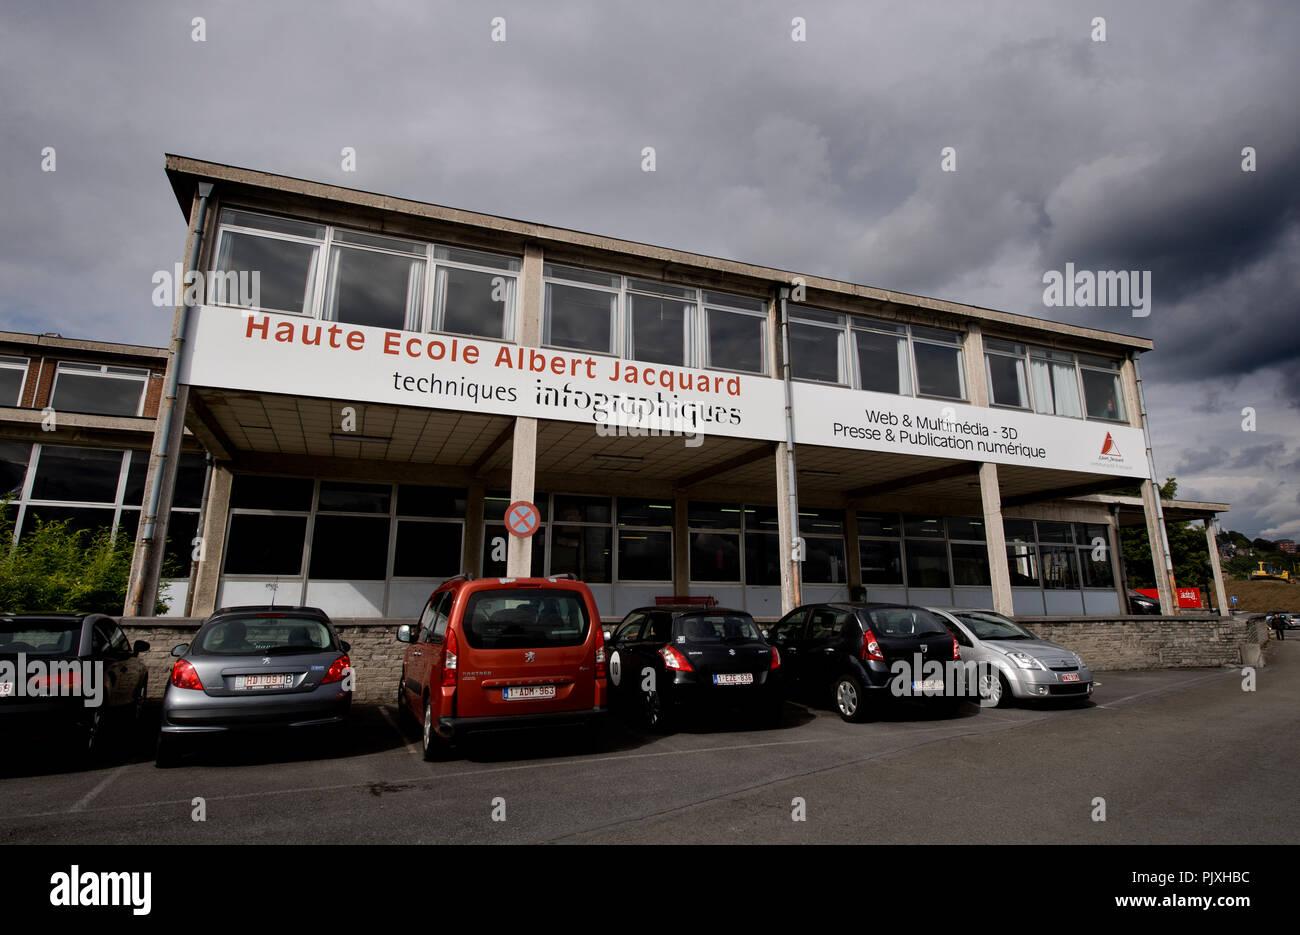 The Haute Ecole Albert Jacquard (HEAJ) high-school in Namur (Belgium, 12/09/2013) - Stock Image